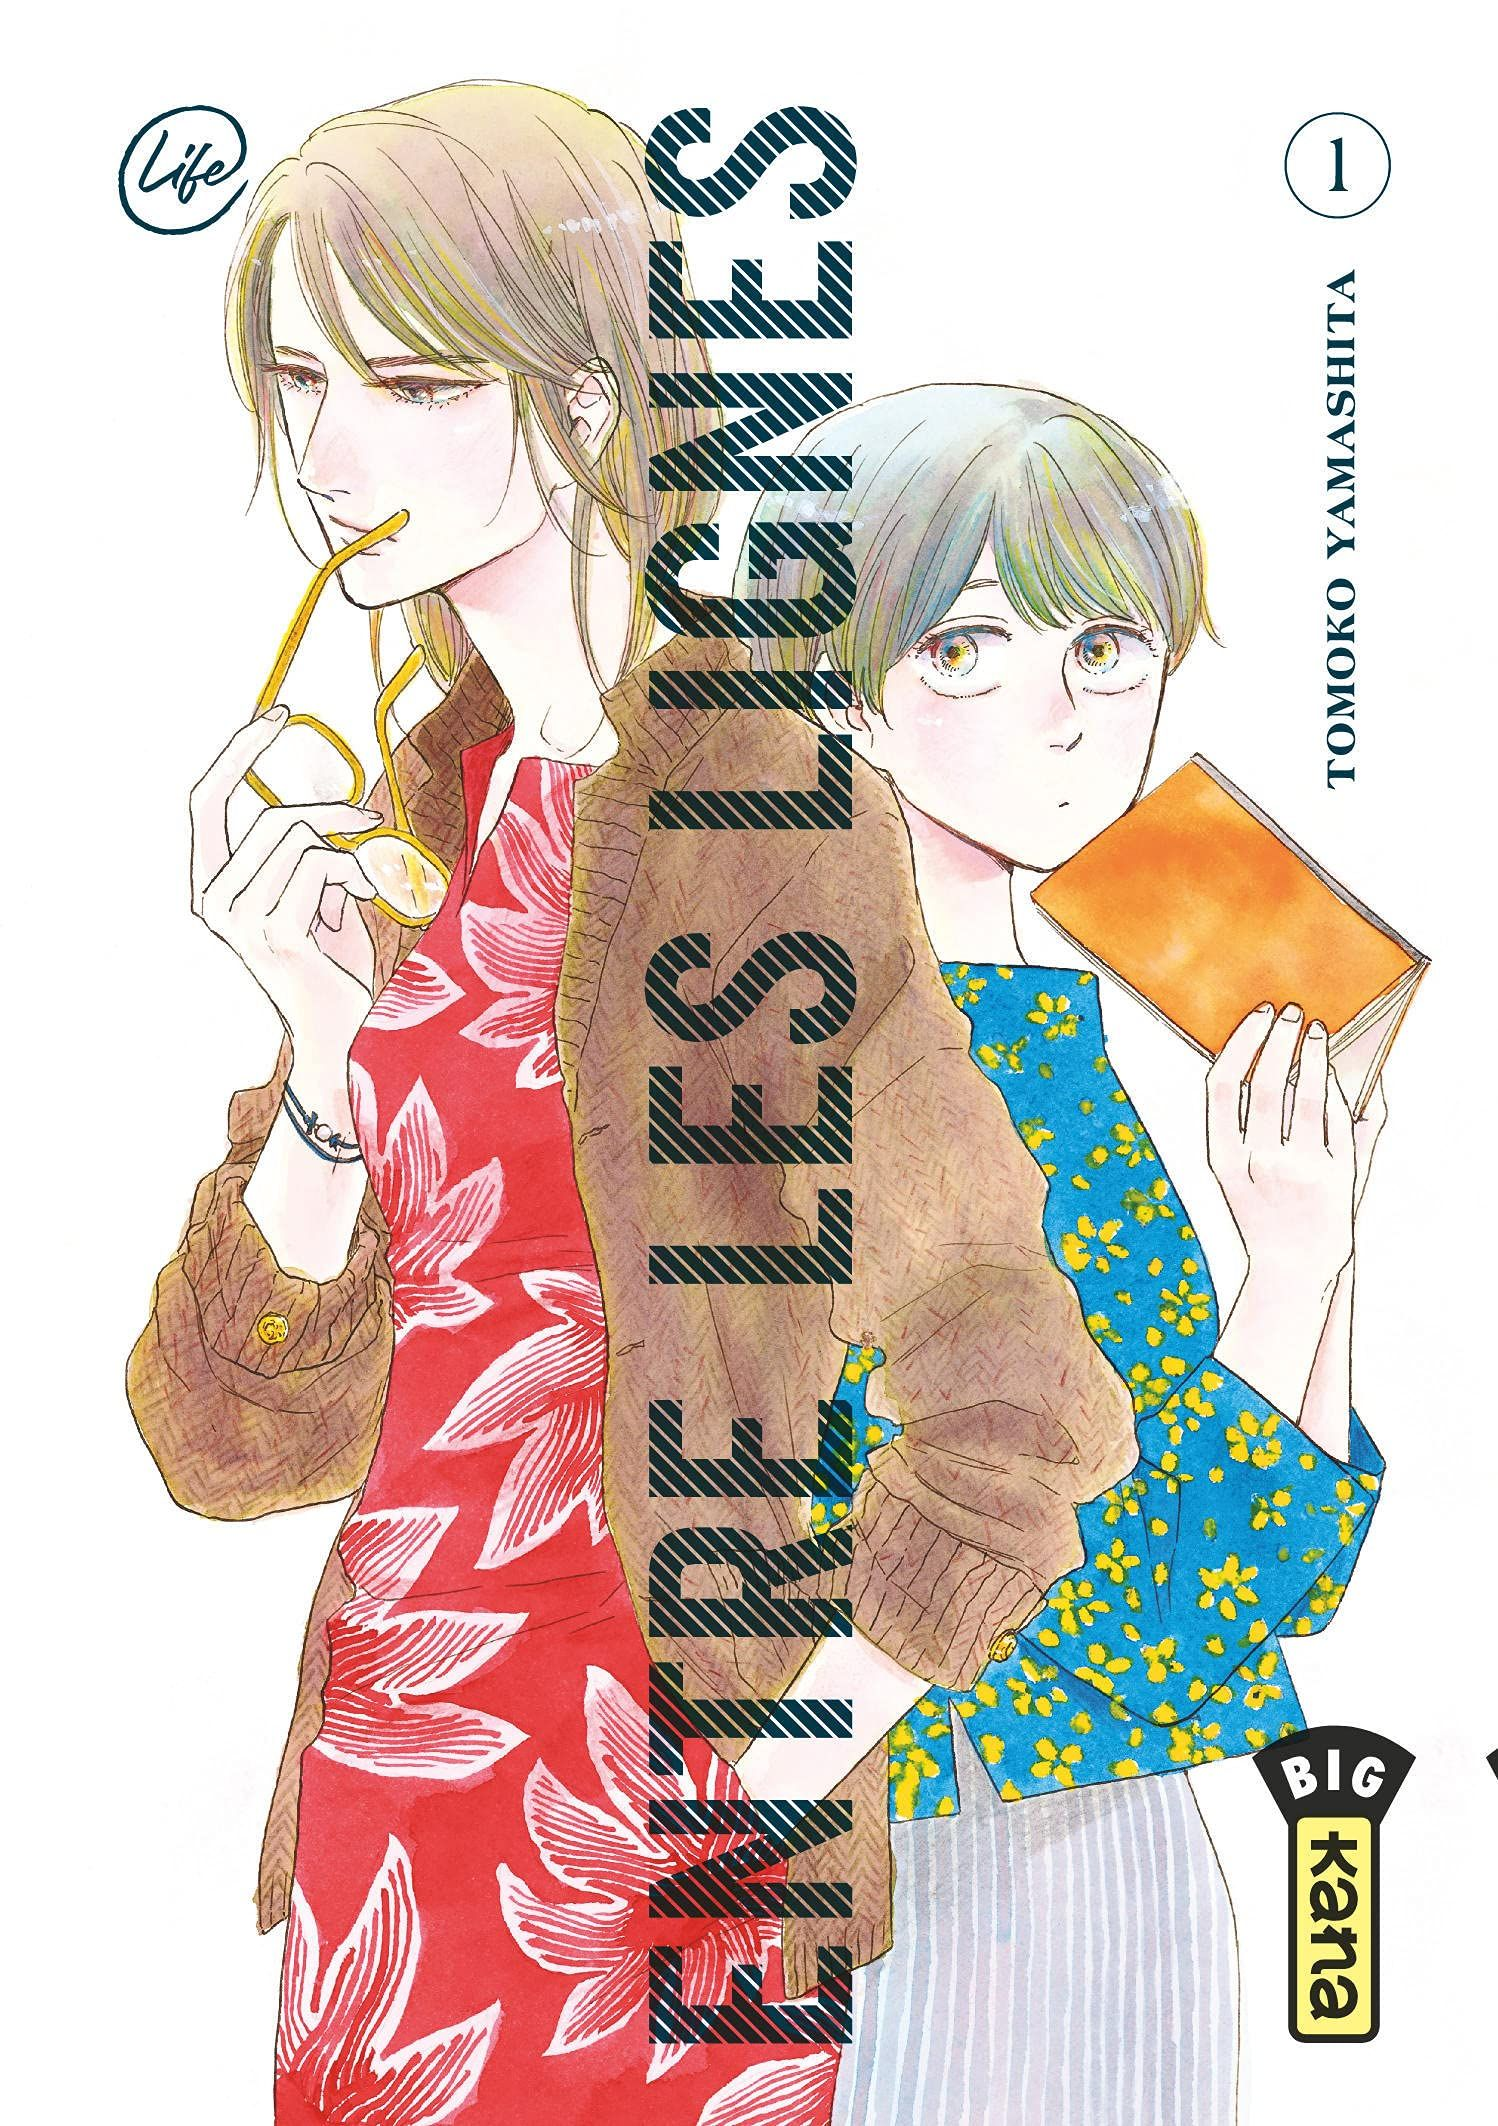 Manga - Entre les lignes